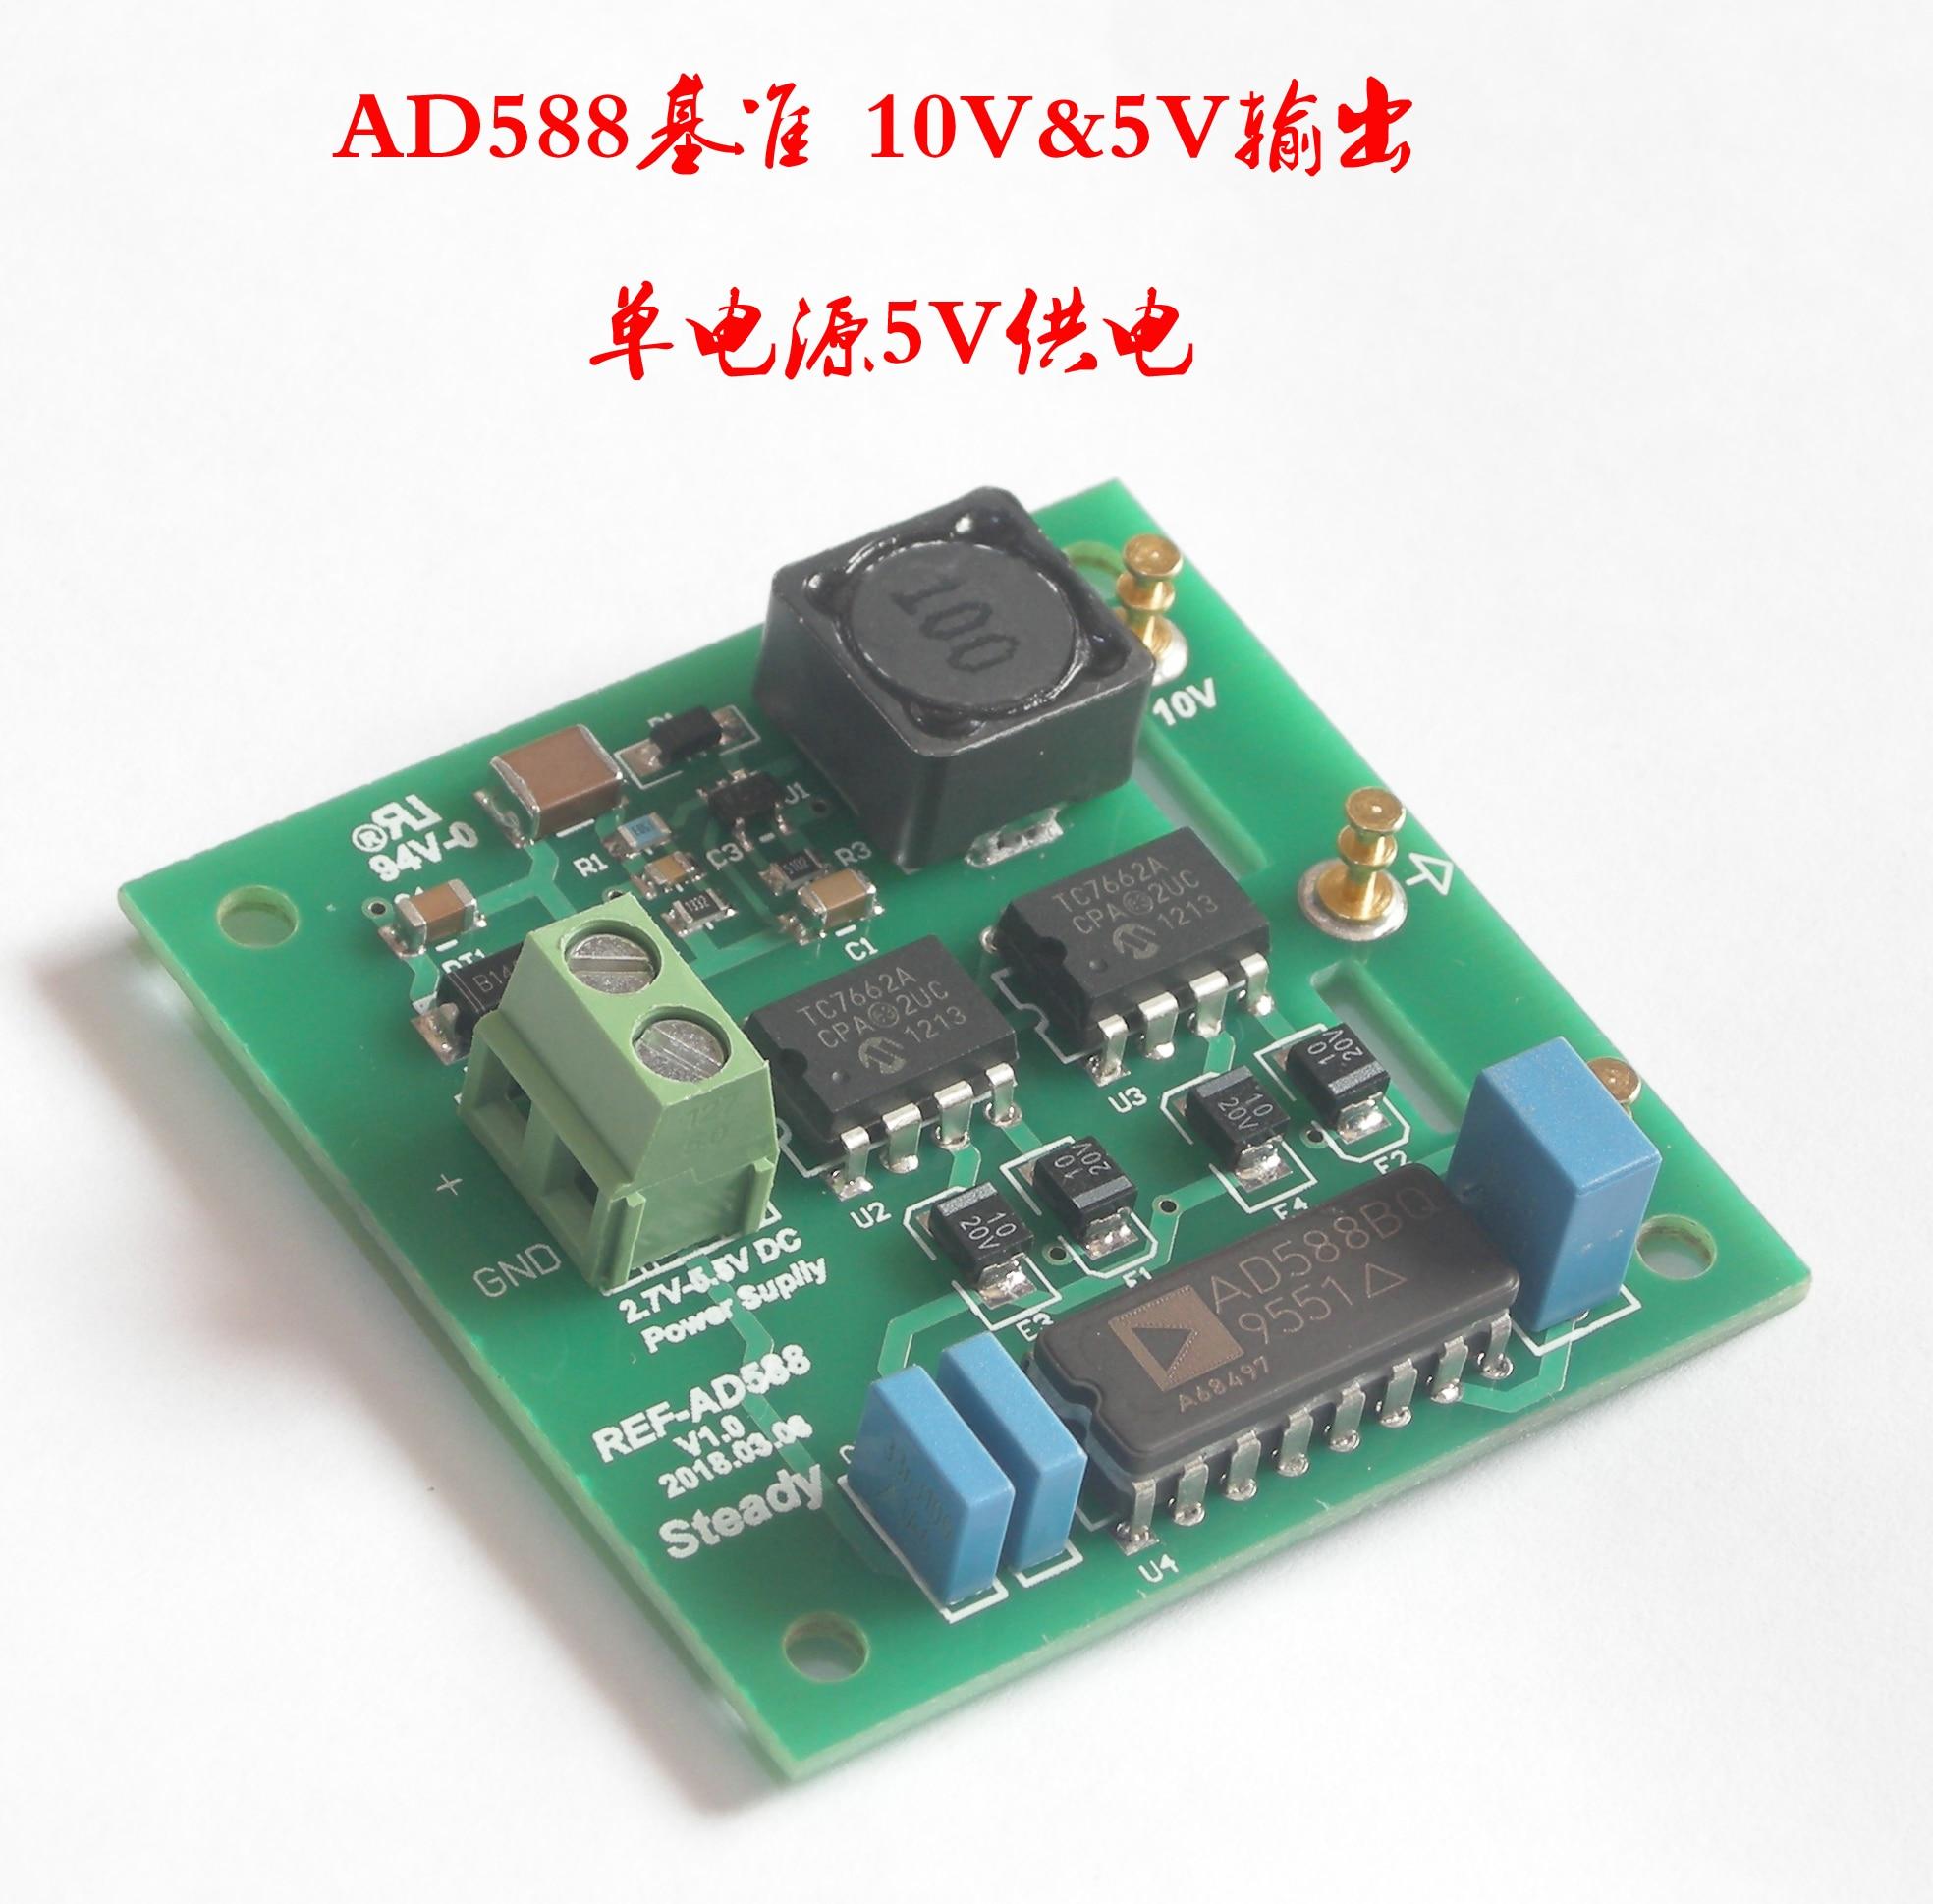 AD588 مرجع ، 10 فولت و 5 فولت إخراج واحد امدادات الطاقة 5 فولت امدادات الطاقة